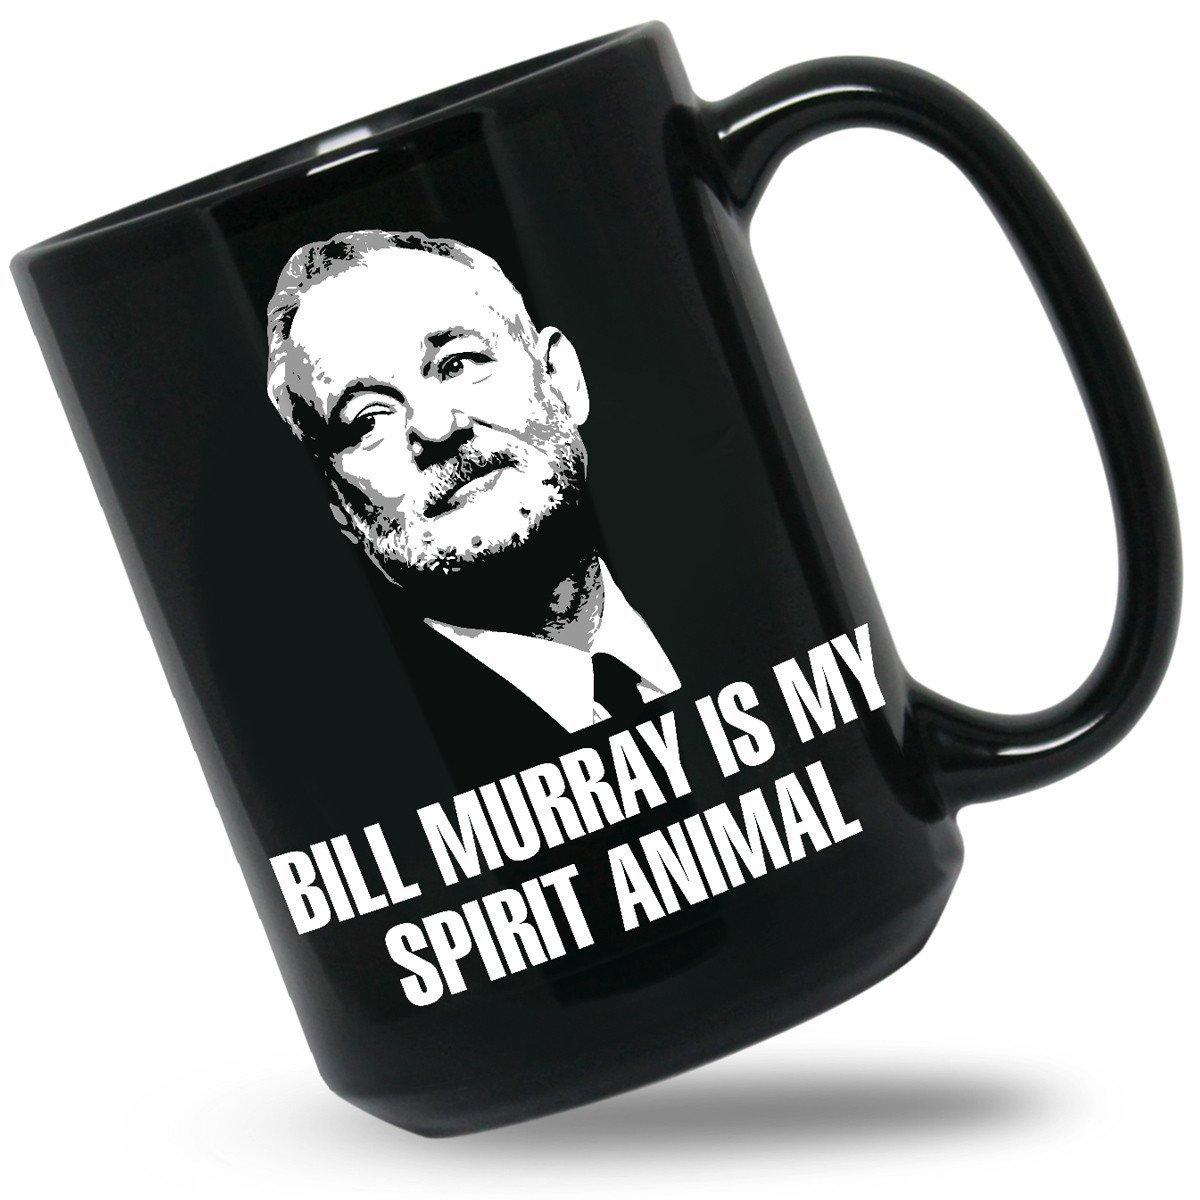 Bill Murray Is My Spirit Animal Mug - Bill Murray Coffee Mugs